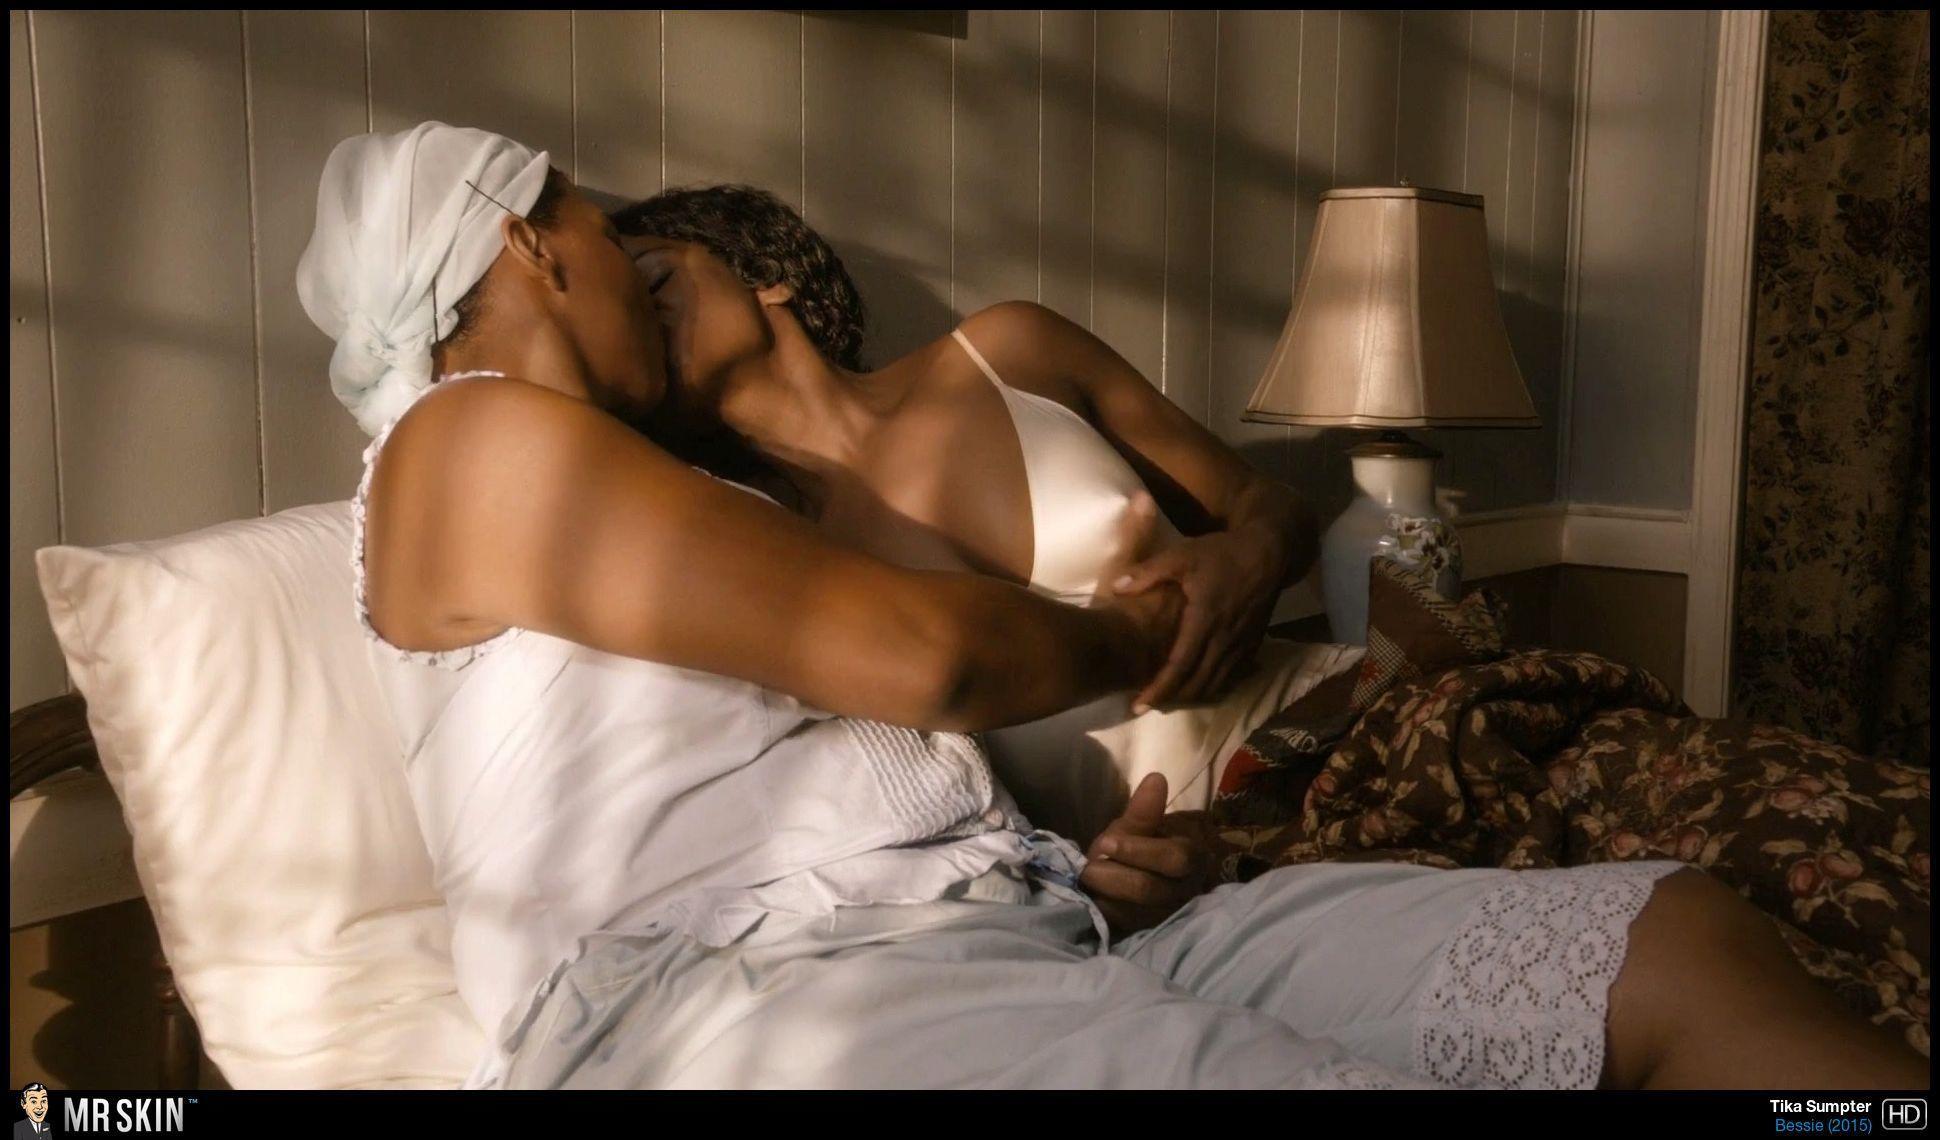 naked guys and girls cuming